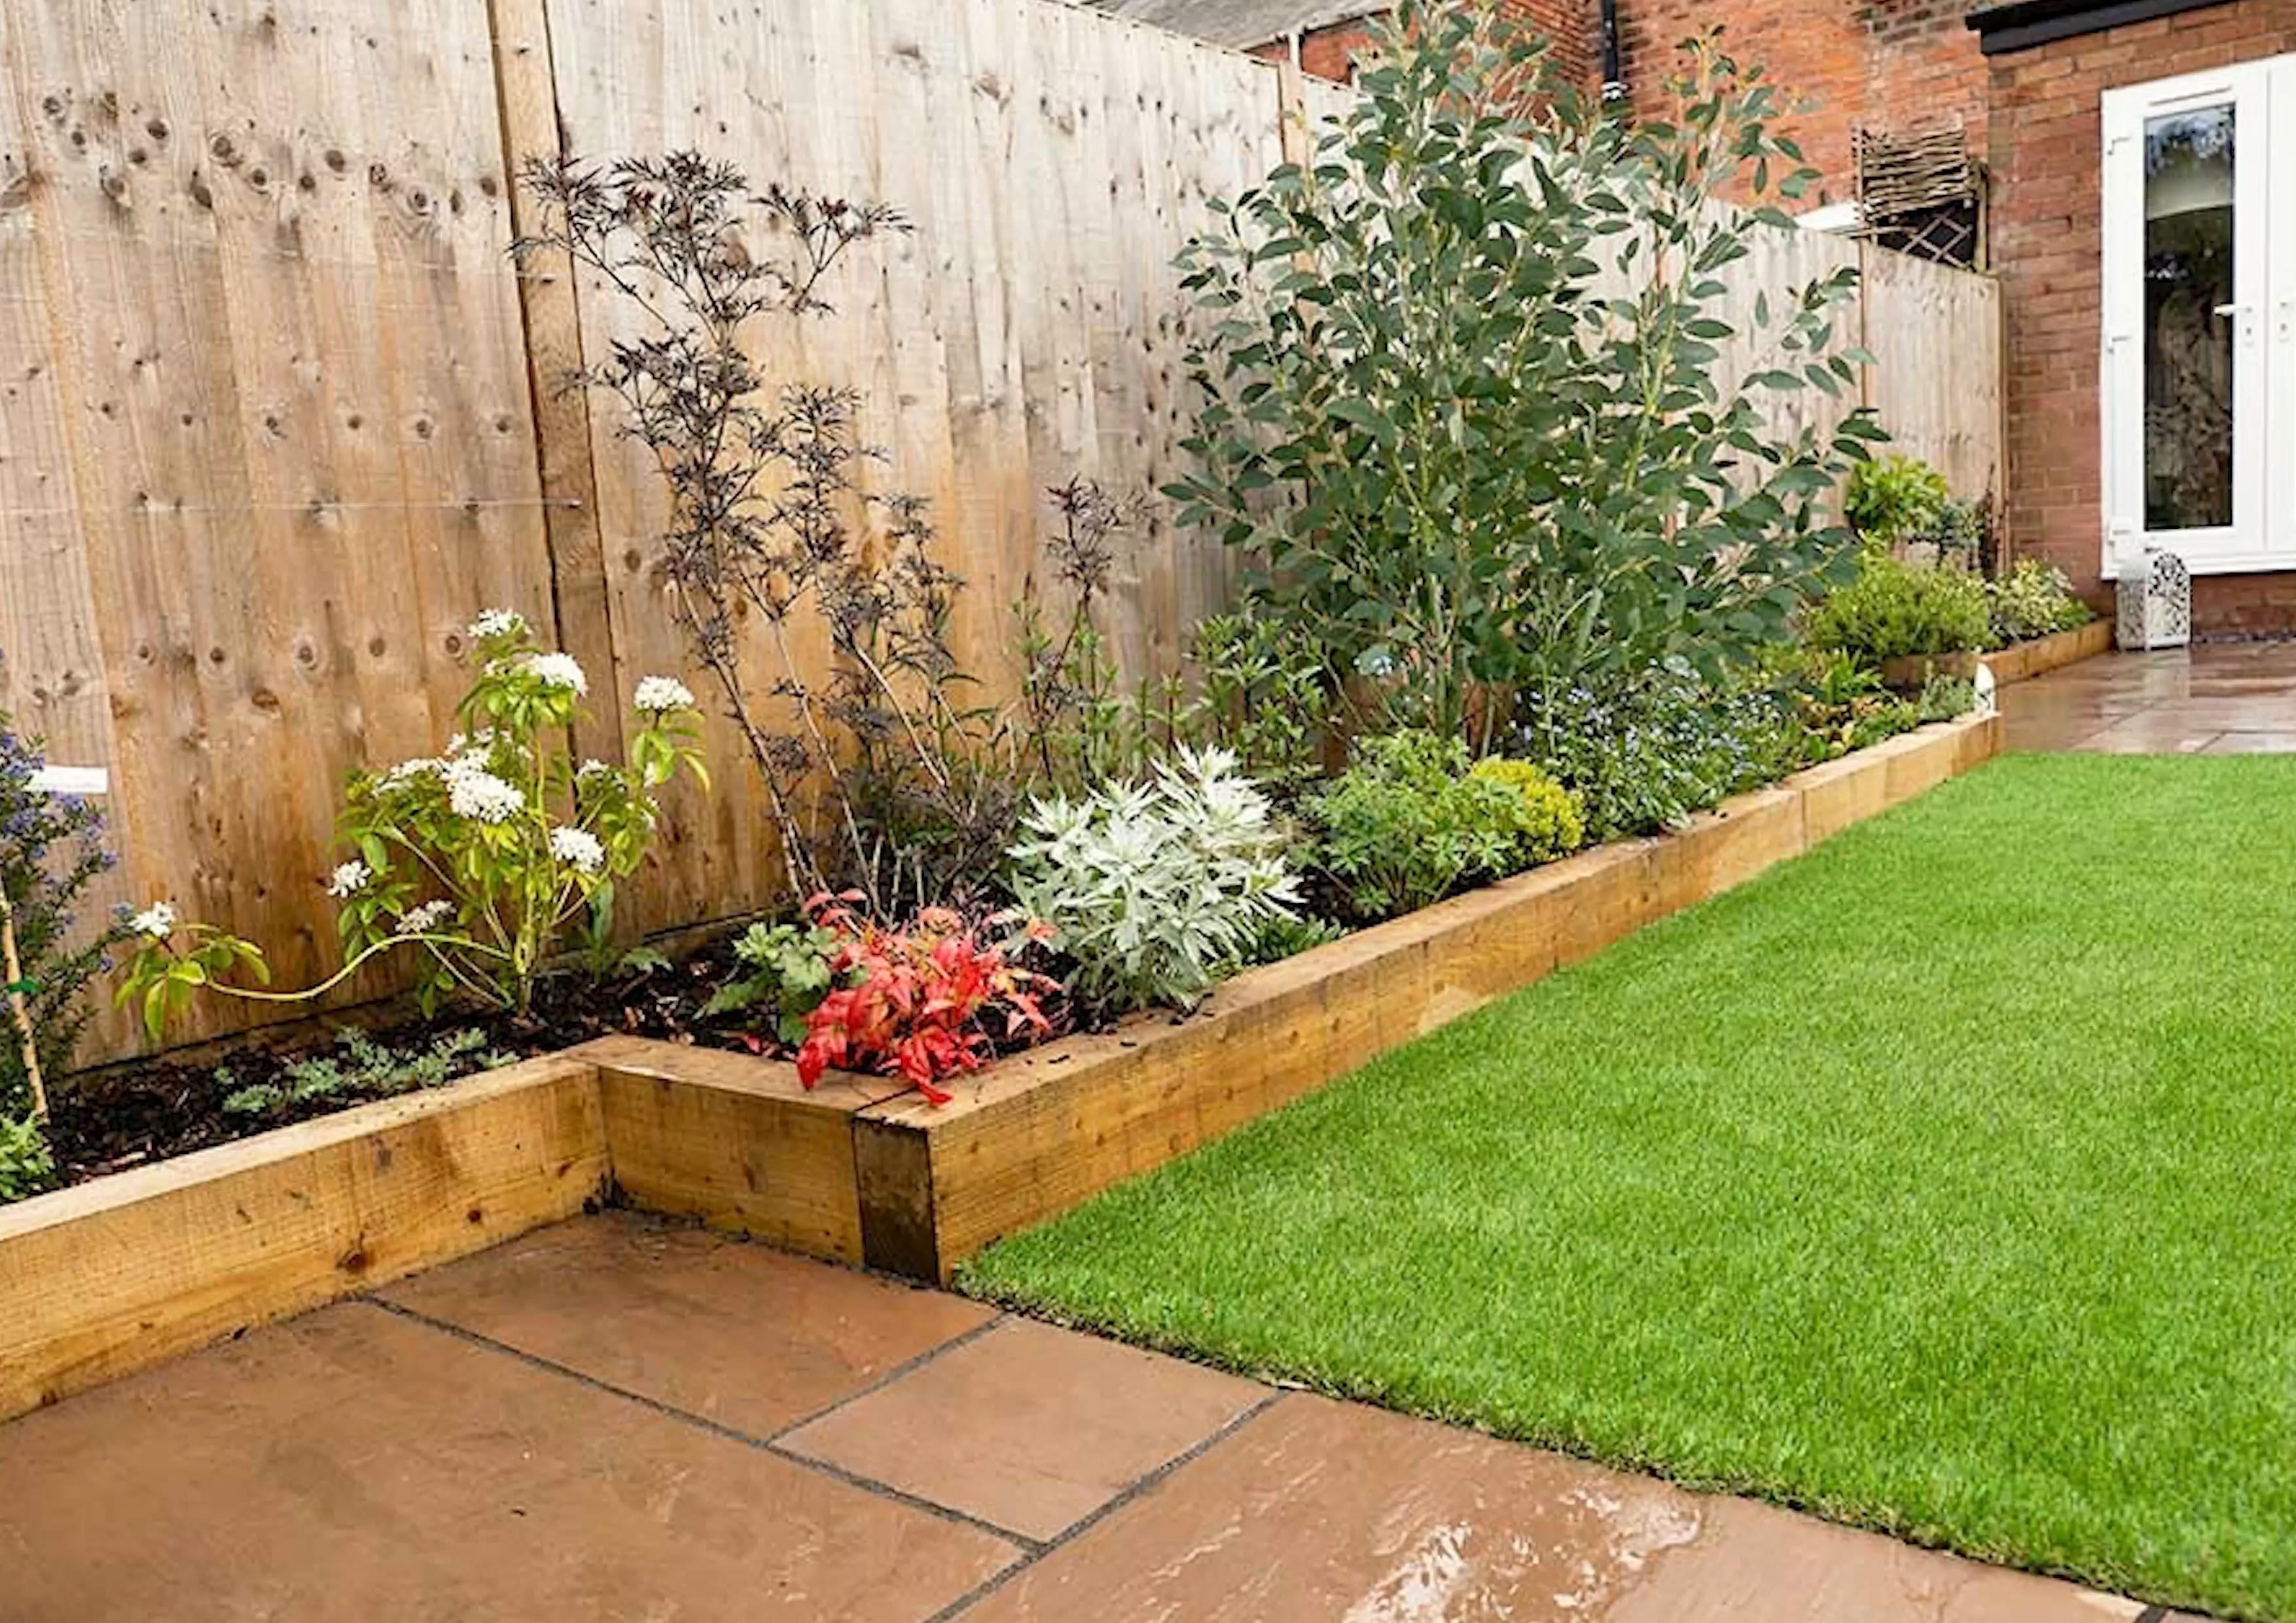 A Long Thin Garden Design And Installation In Shrewsbury Shropshire Bloge Fashion Long Blooming Perennial In 2020 Garden Design Garden Dividers Back Garden Design